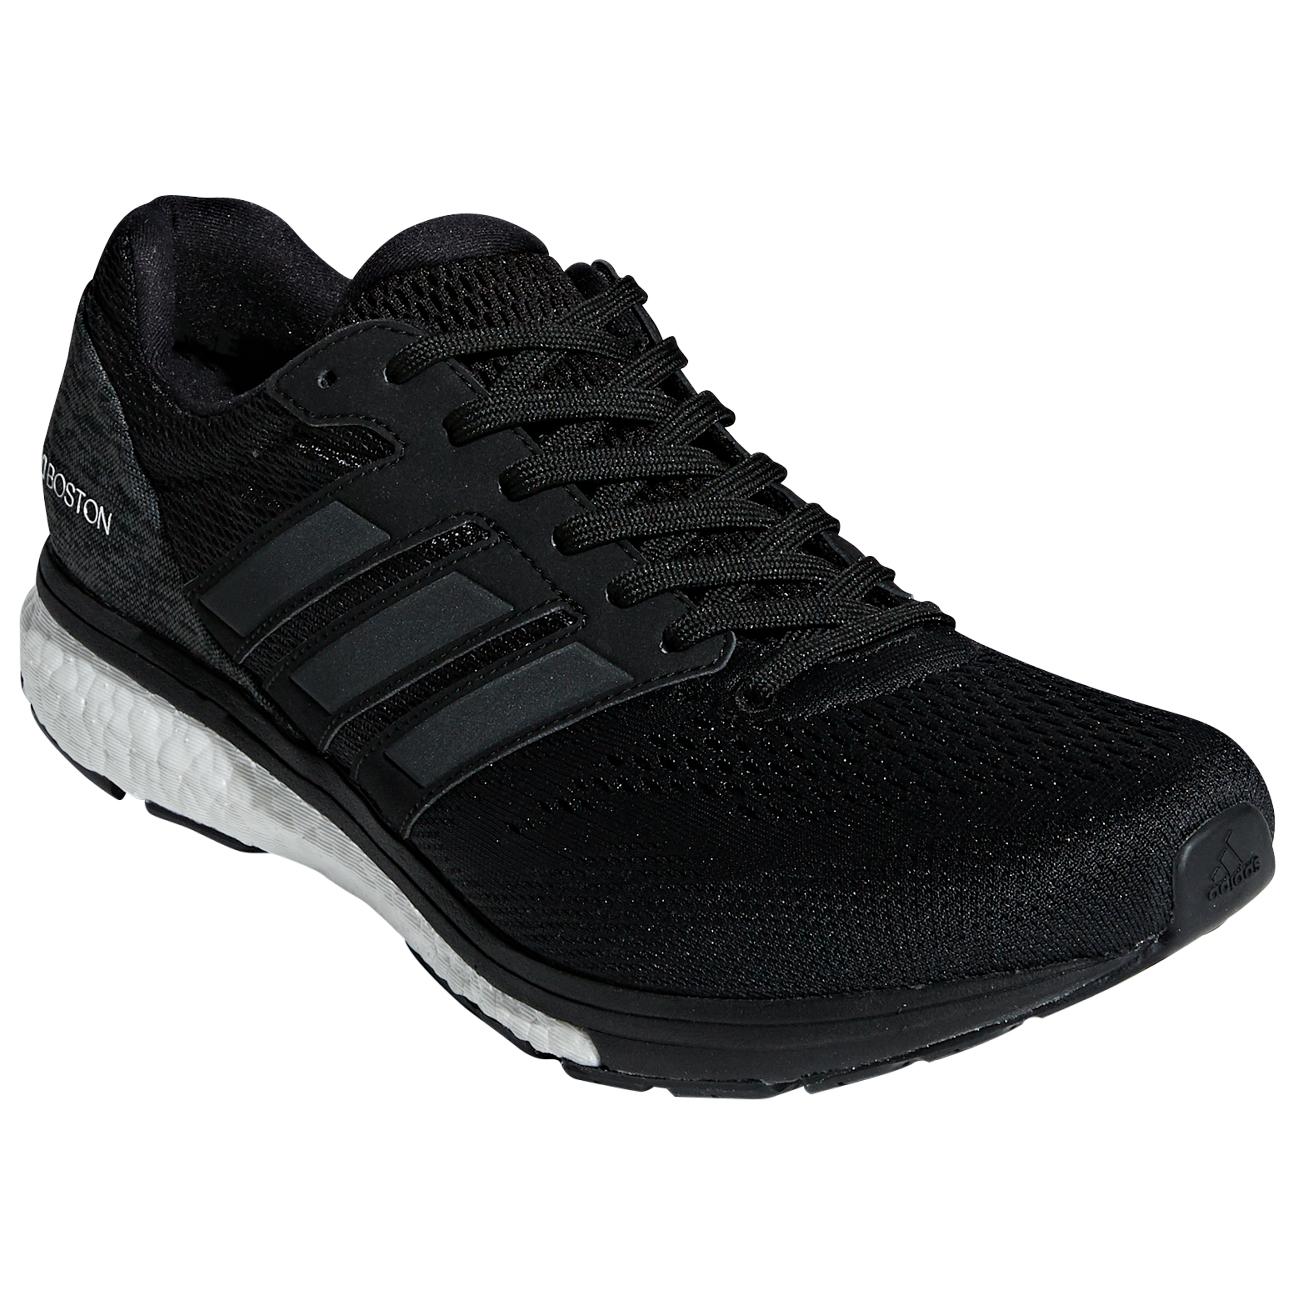 huge discount 61b5a ebfe0 Adidas Adizero Boston 7 - Running shoes Mens  Free EU Delive